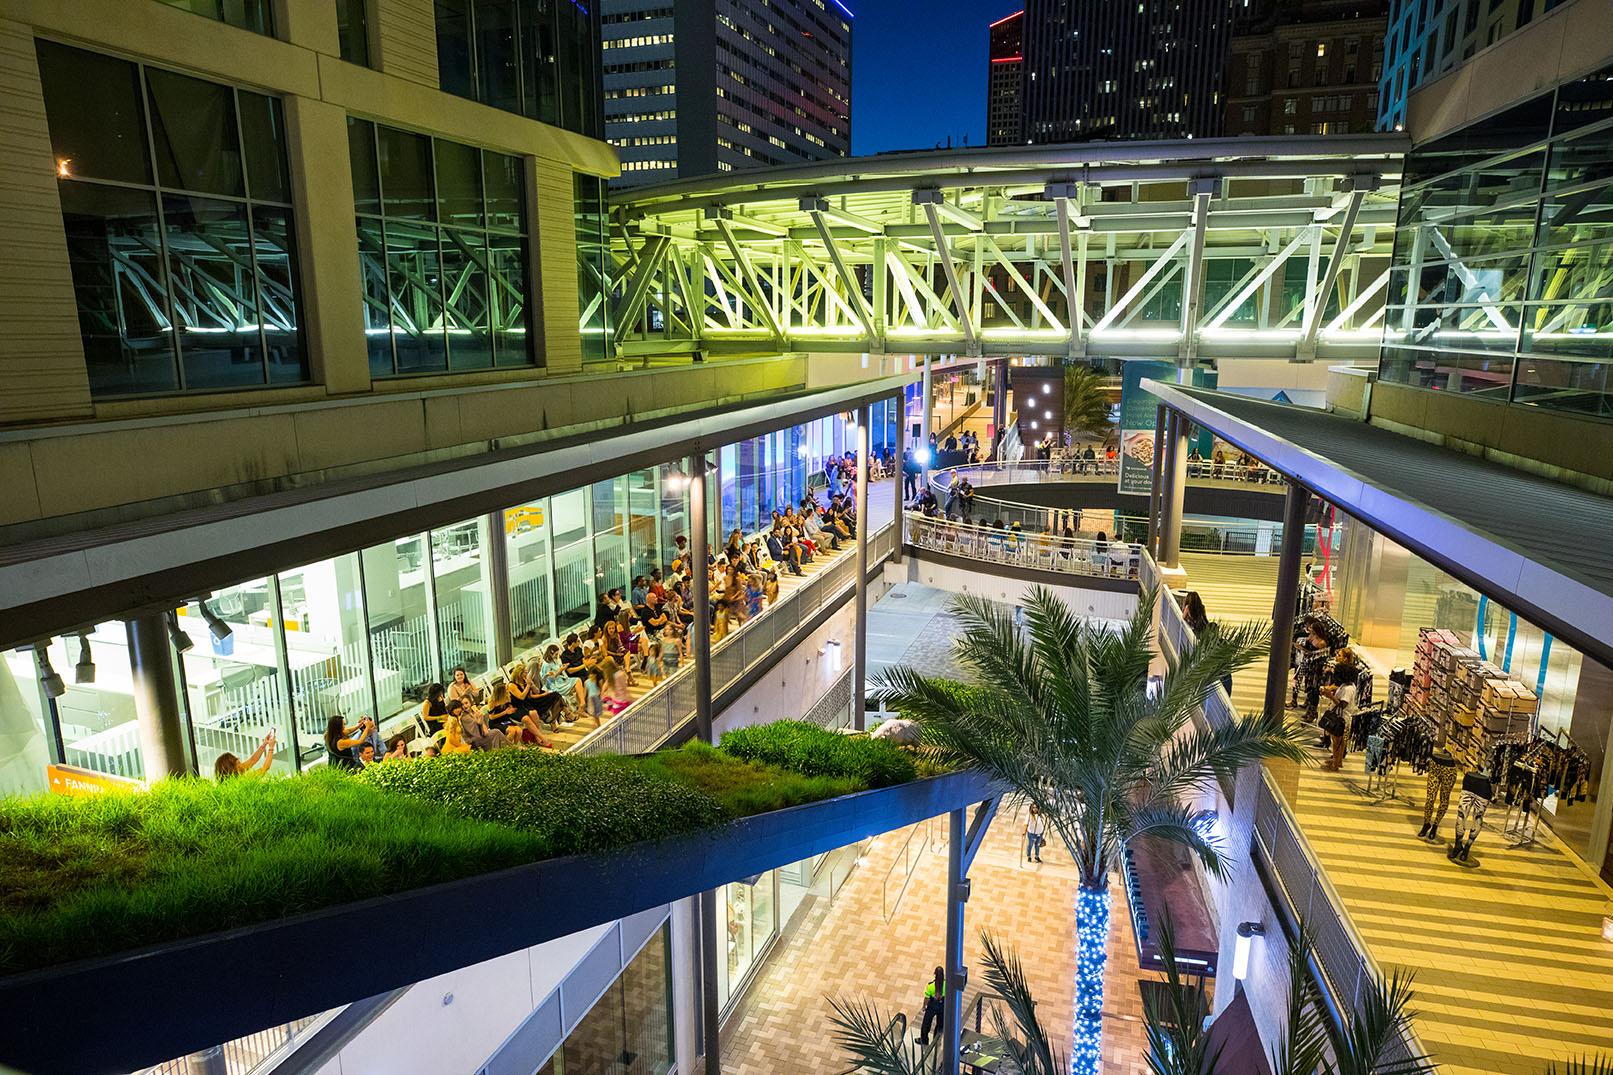 GreenStreet in Houston, Texas